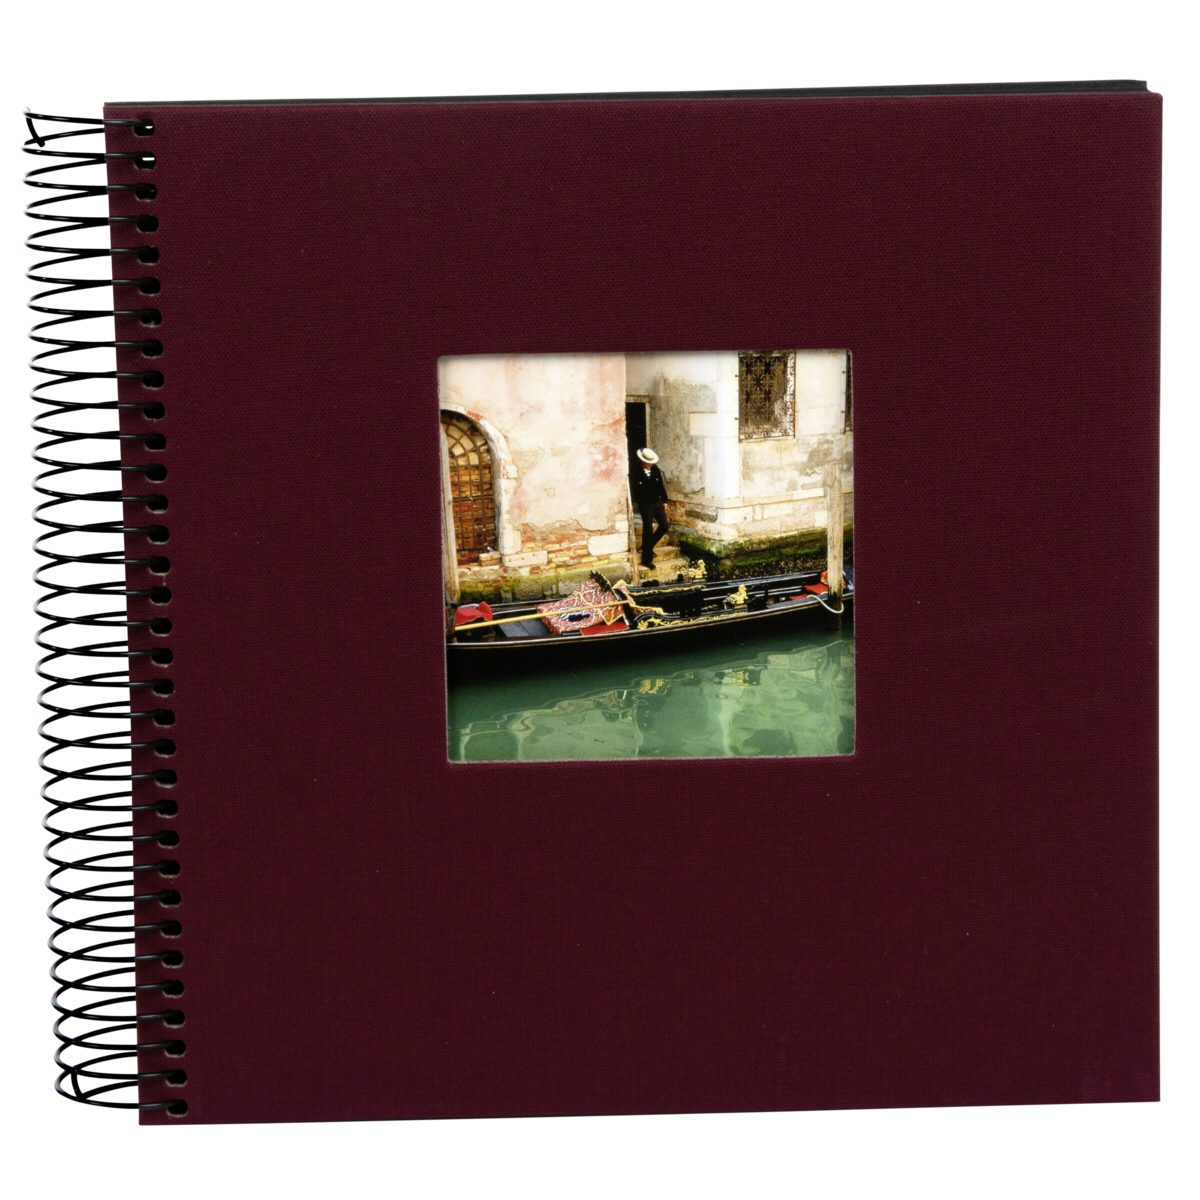 Goldbuch Aufbewahrung »Bella Vista bord. 20x20 40 e Seiten Spiral 12764«